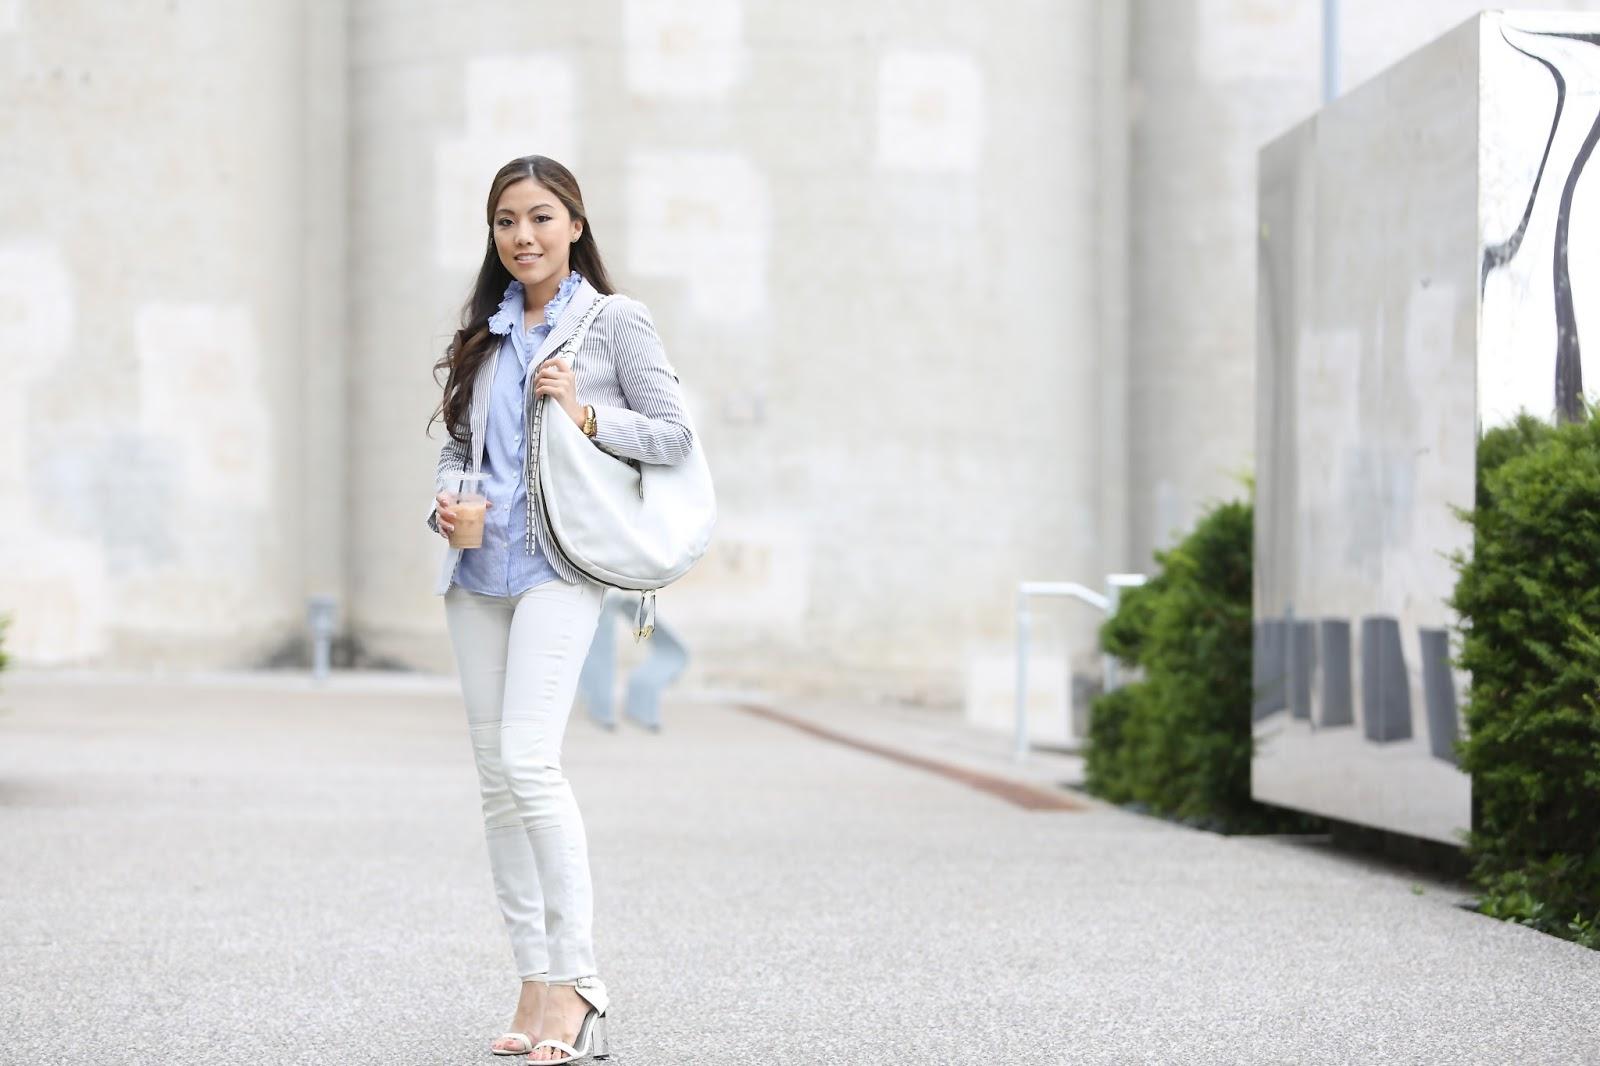 acdcd0a598 J.Crew shirt. Banana Republic striped suit jacket. J Brand leather knee  skinny. SENSO sasha II Oryany shoulder bag (in Azzuro & Cameo) Seiko mens  watch